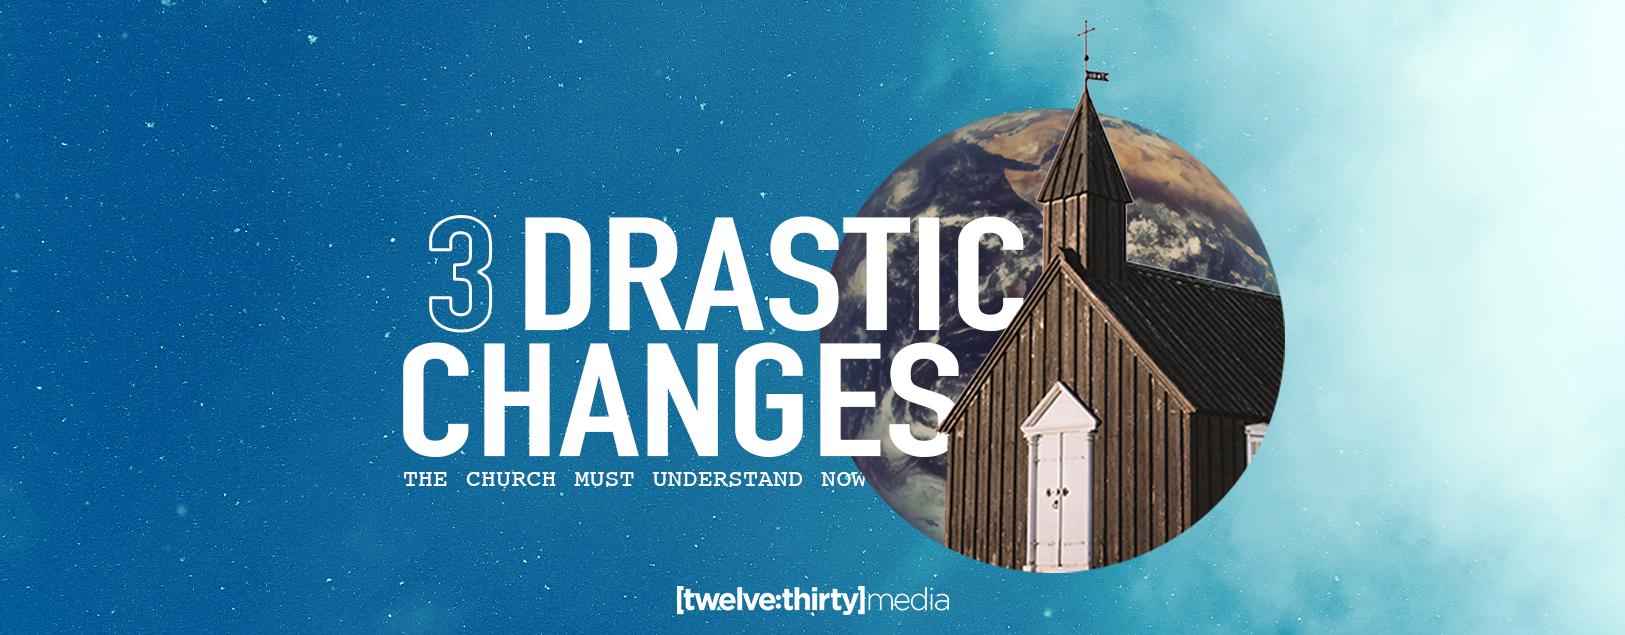 3 Drastic Changes